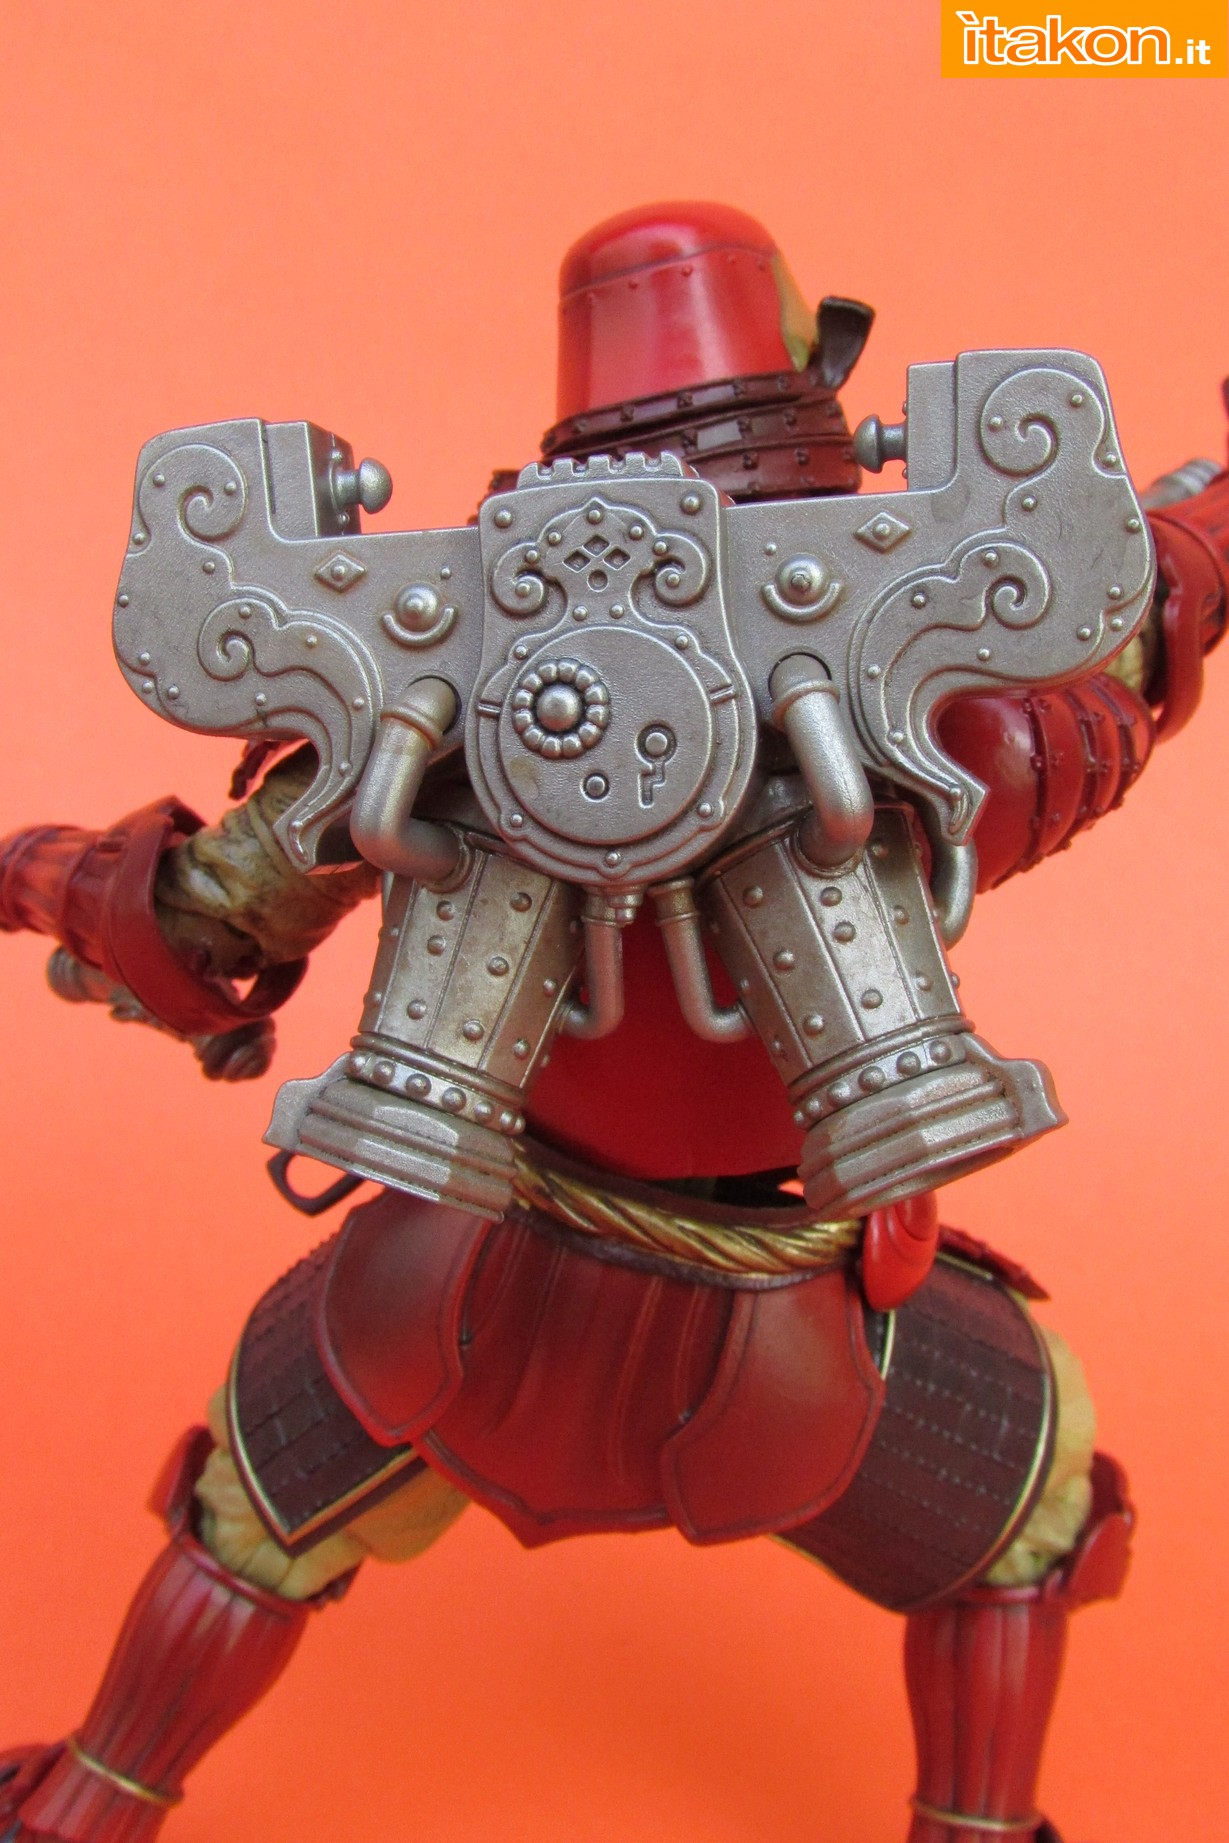 Link a Marvel Comics Koutetsu Samurai Iron Man Mark 3 Meishou MANGA REALIZATION review Bandai Itakon.it39